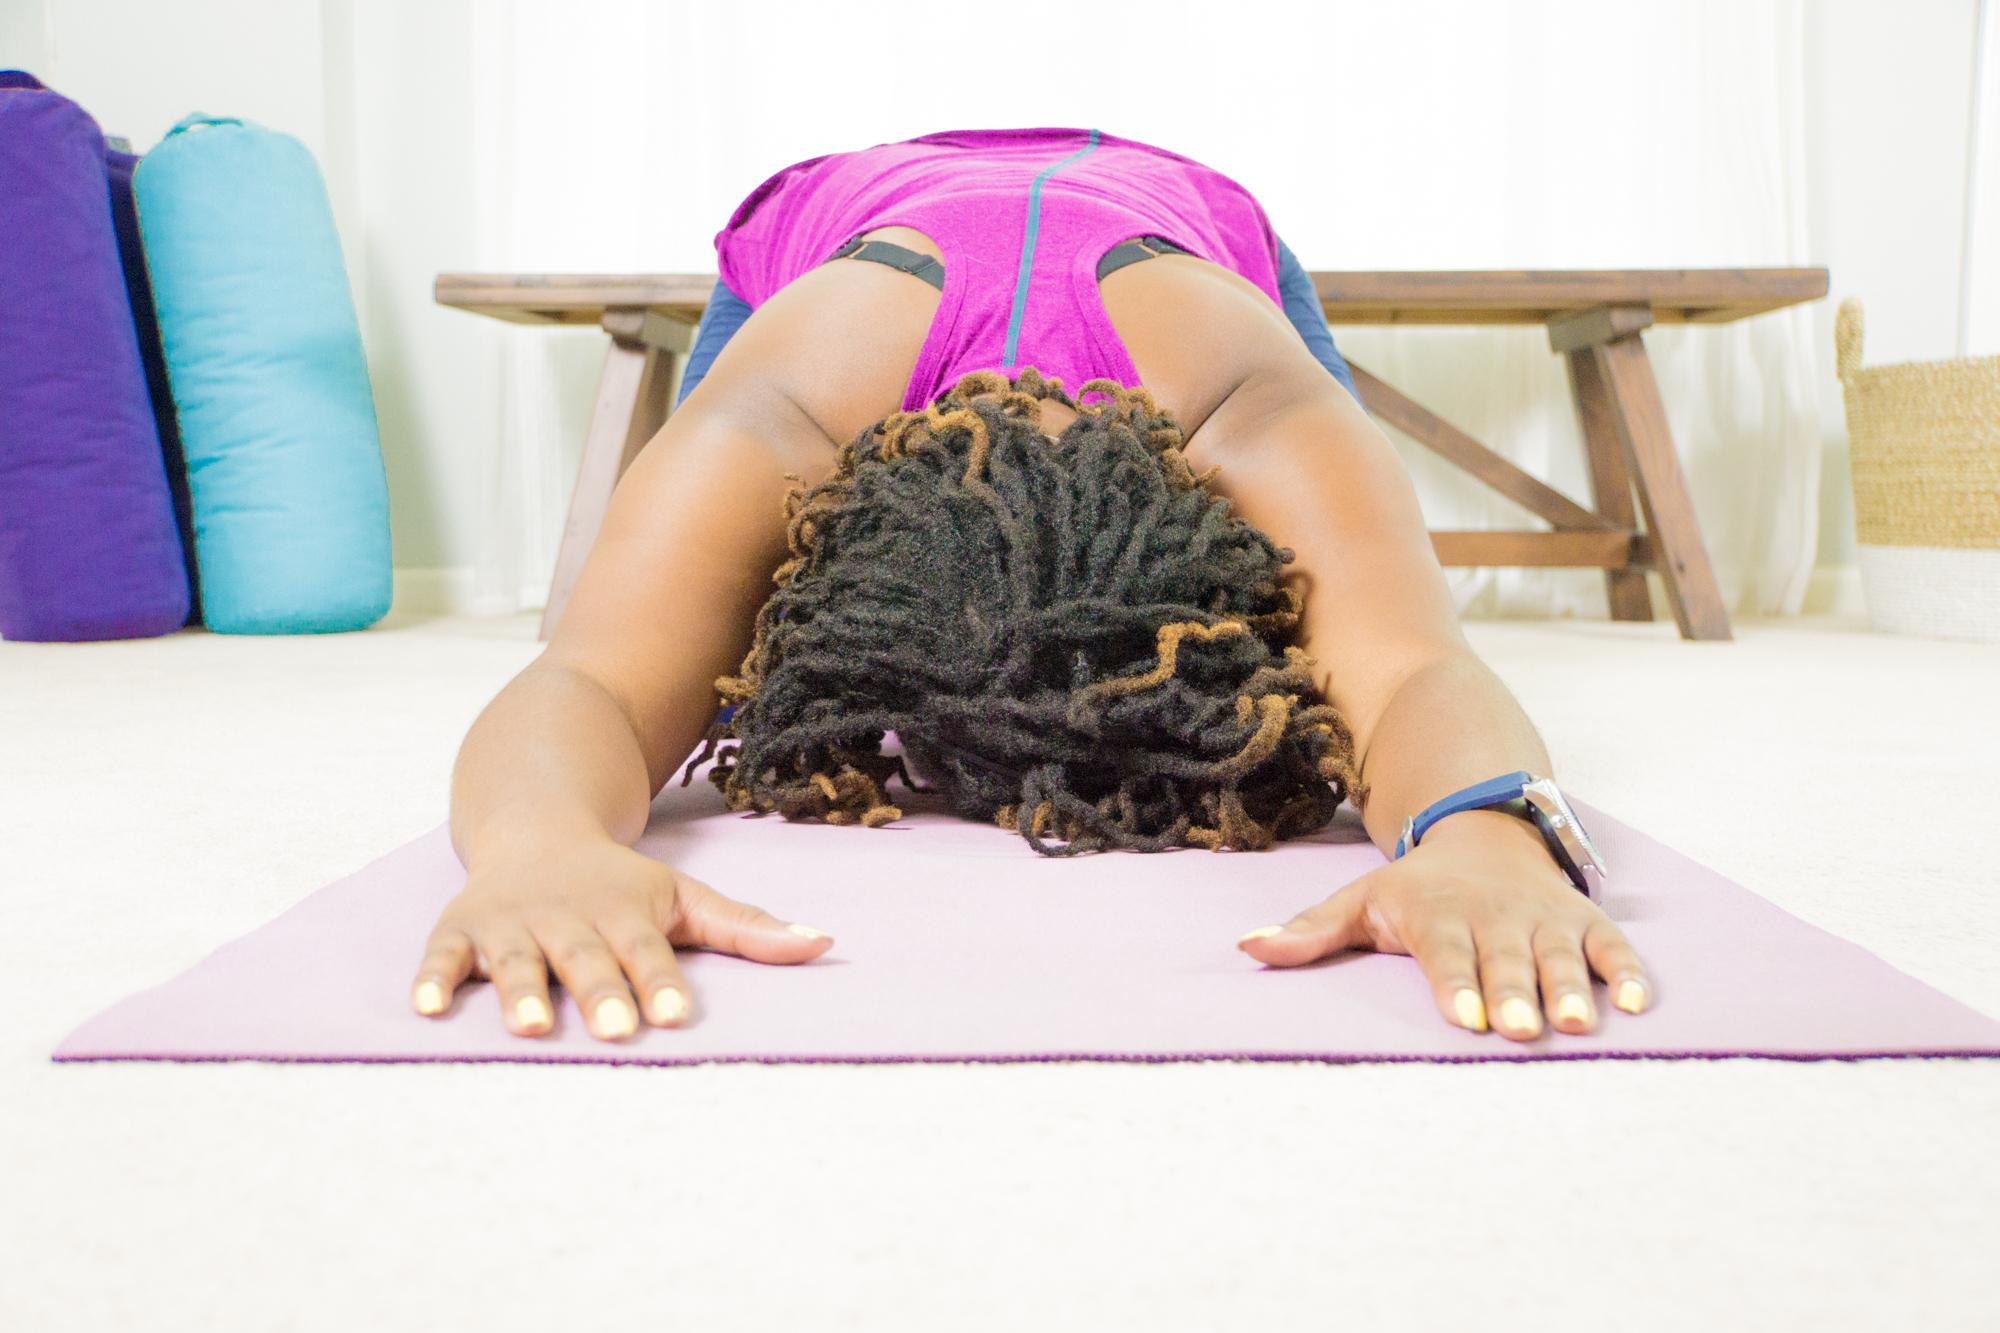 Hopes Yoga Studio Pics and Meagan-09061.jpg